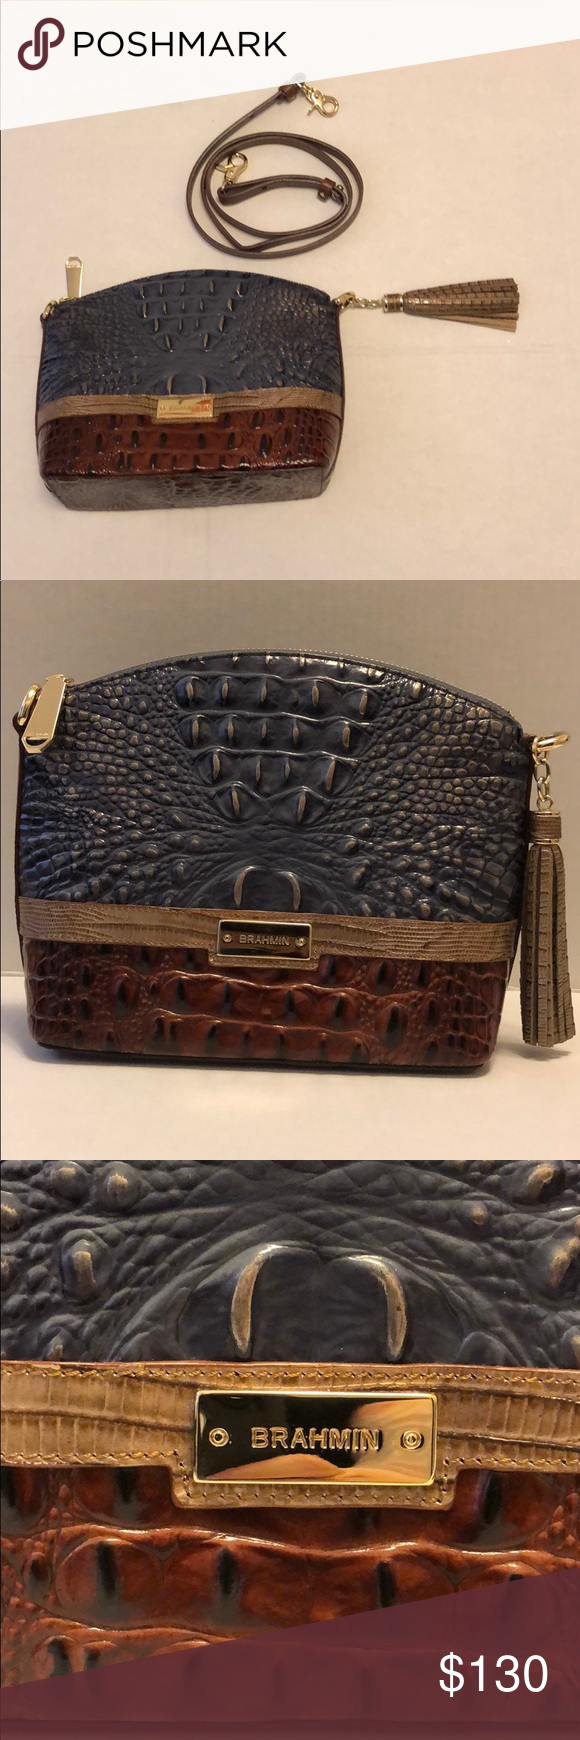 "Brahmin Embossed Leather crossbody bag 10"" W x 8"" L x 3 1"